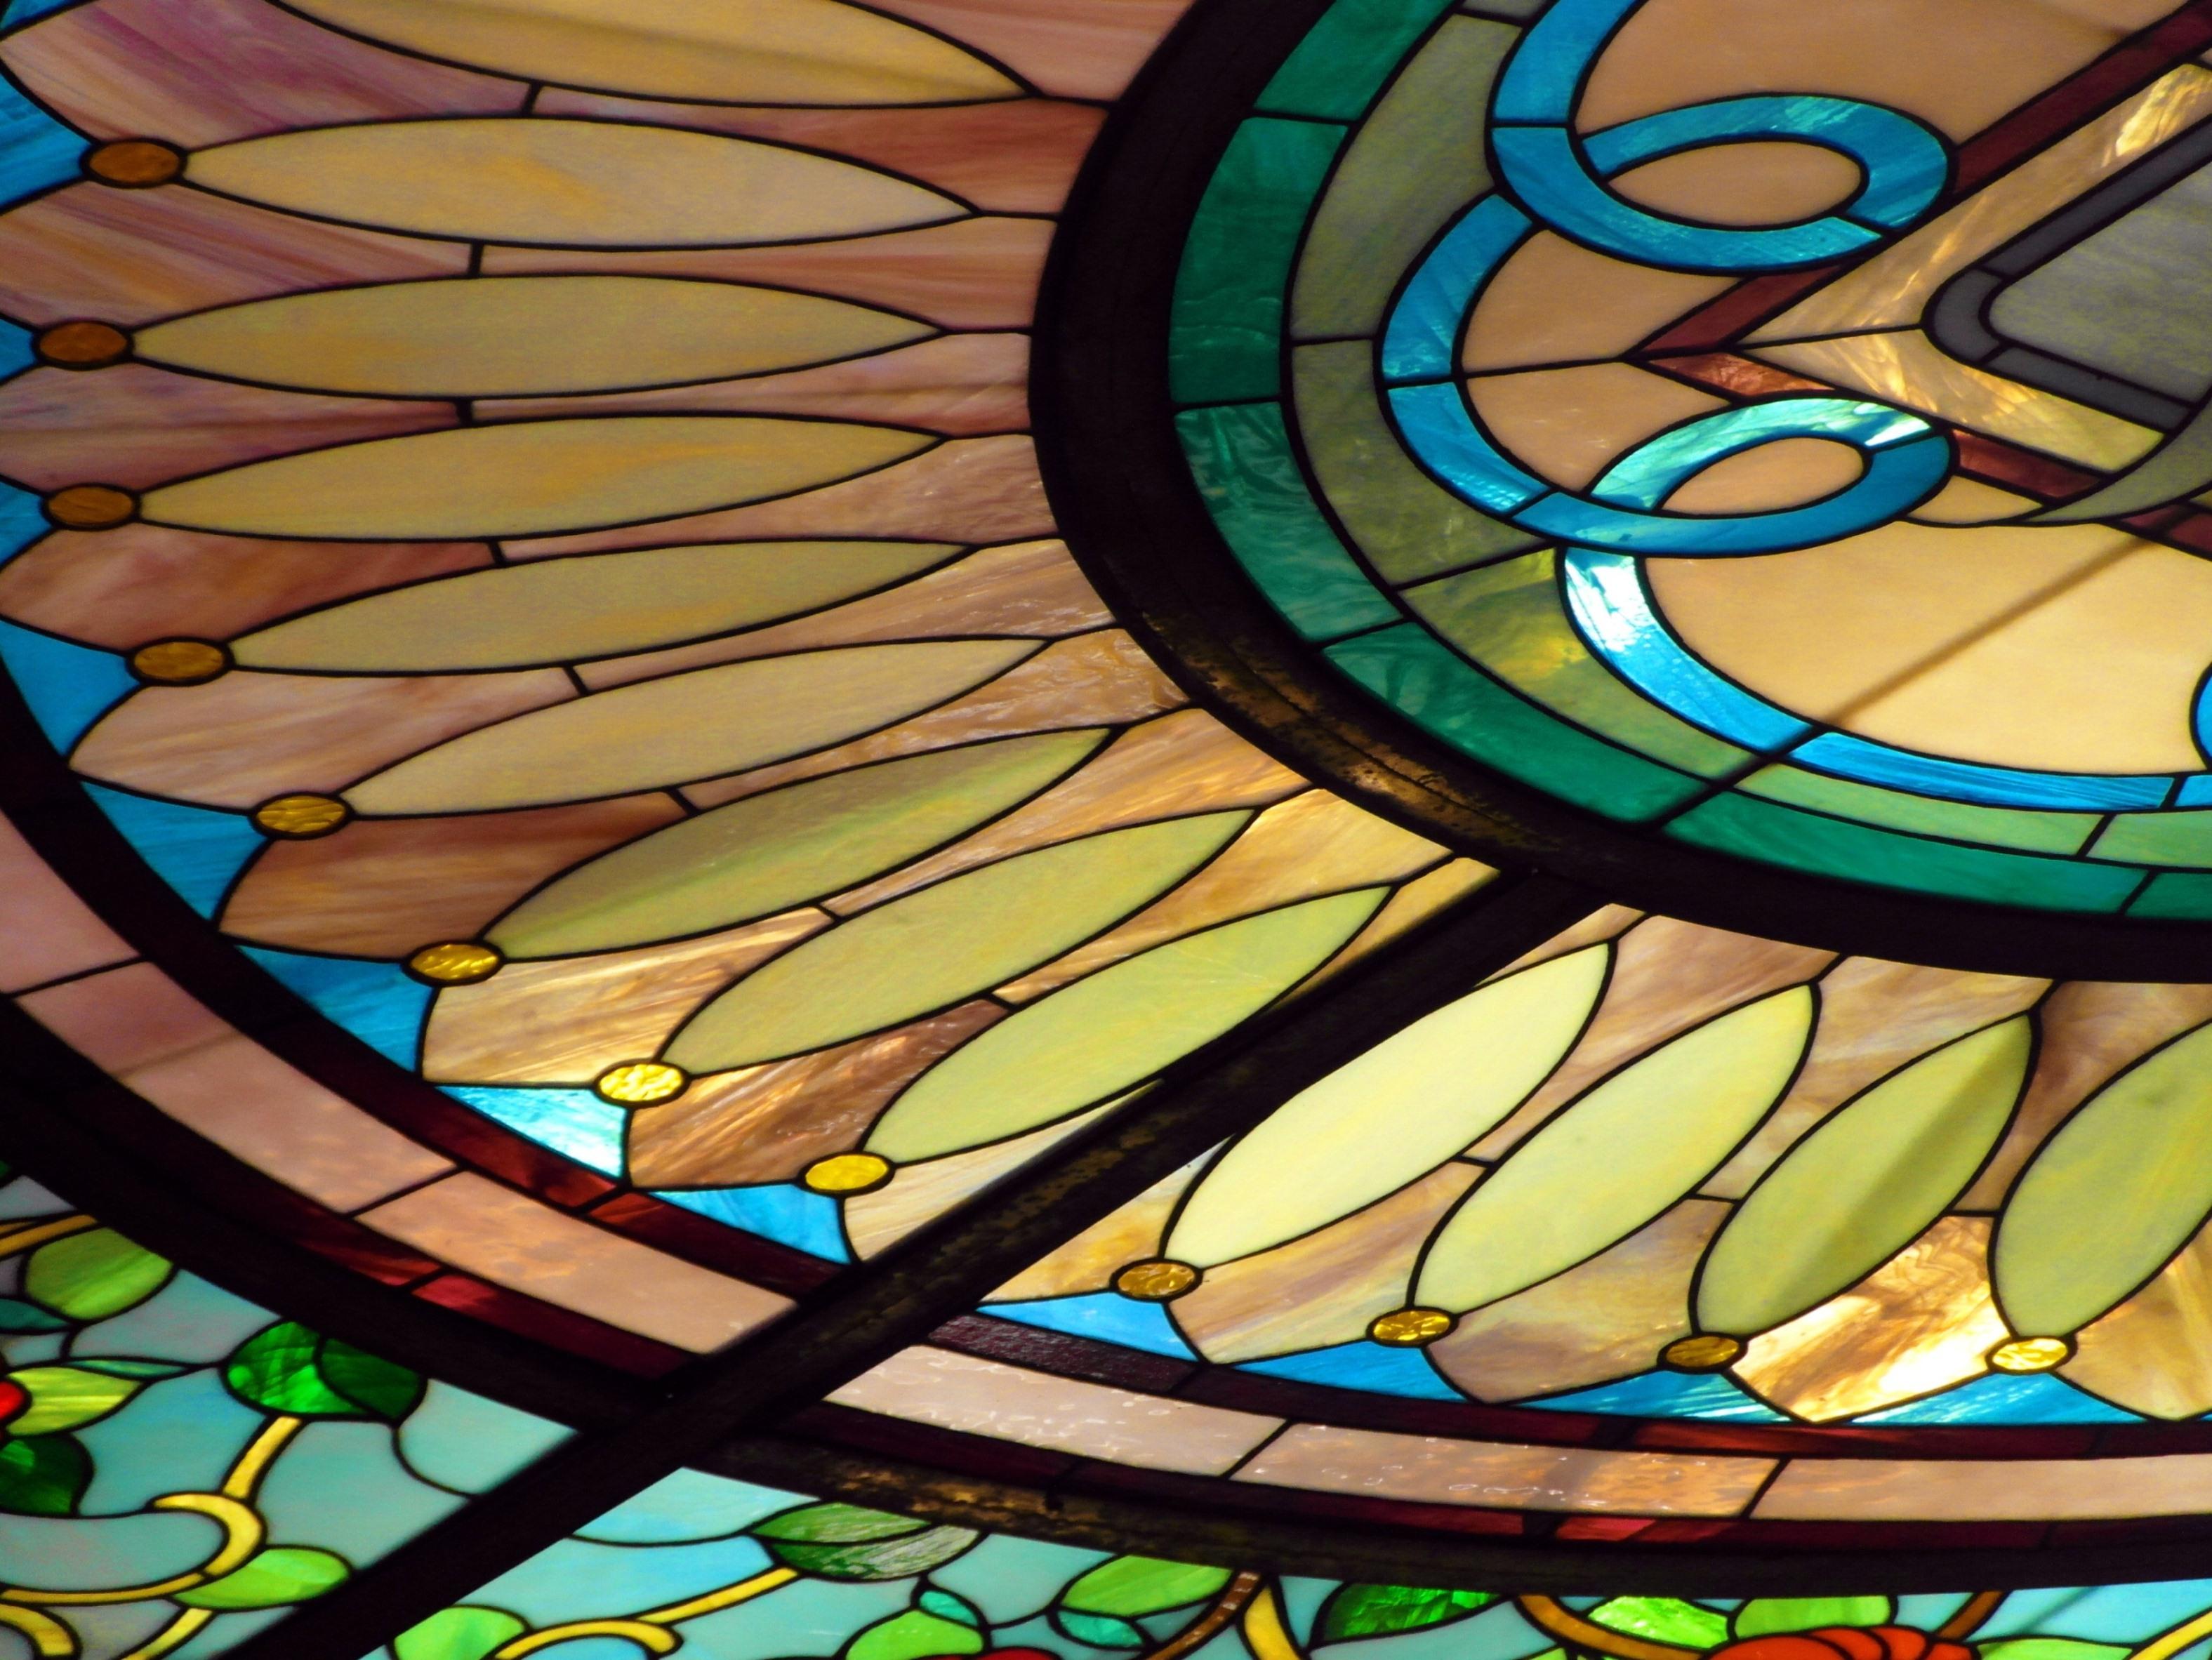 stockvault-stained-glass-window167159.jpg